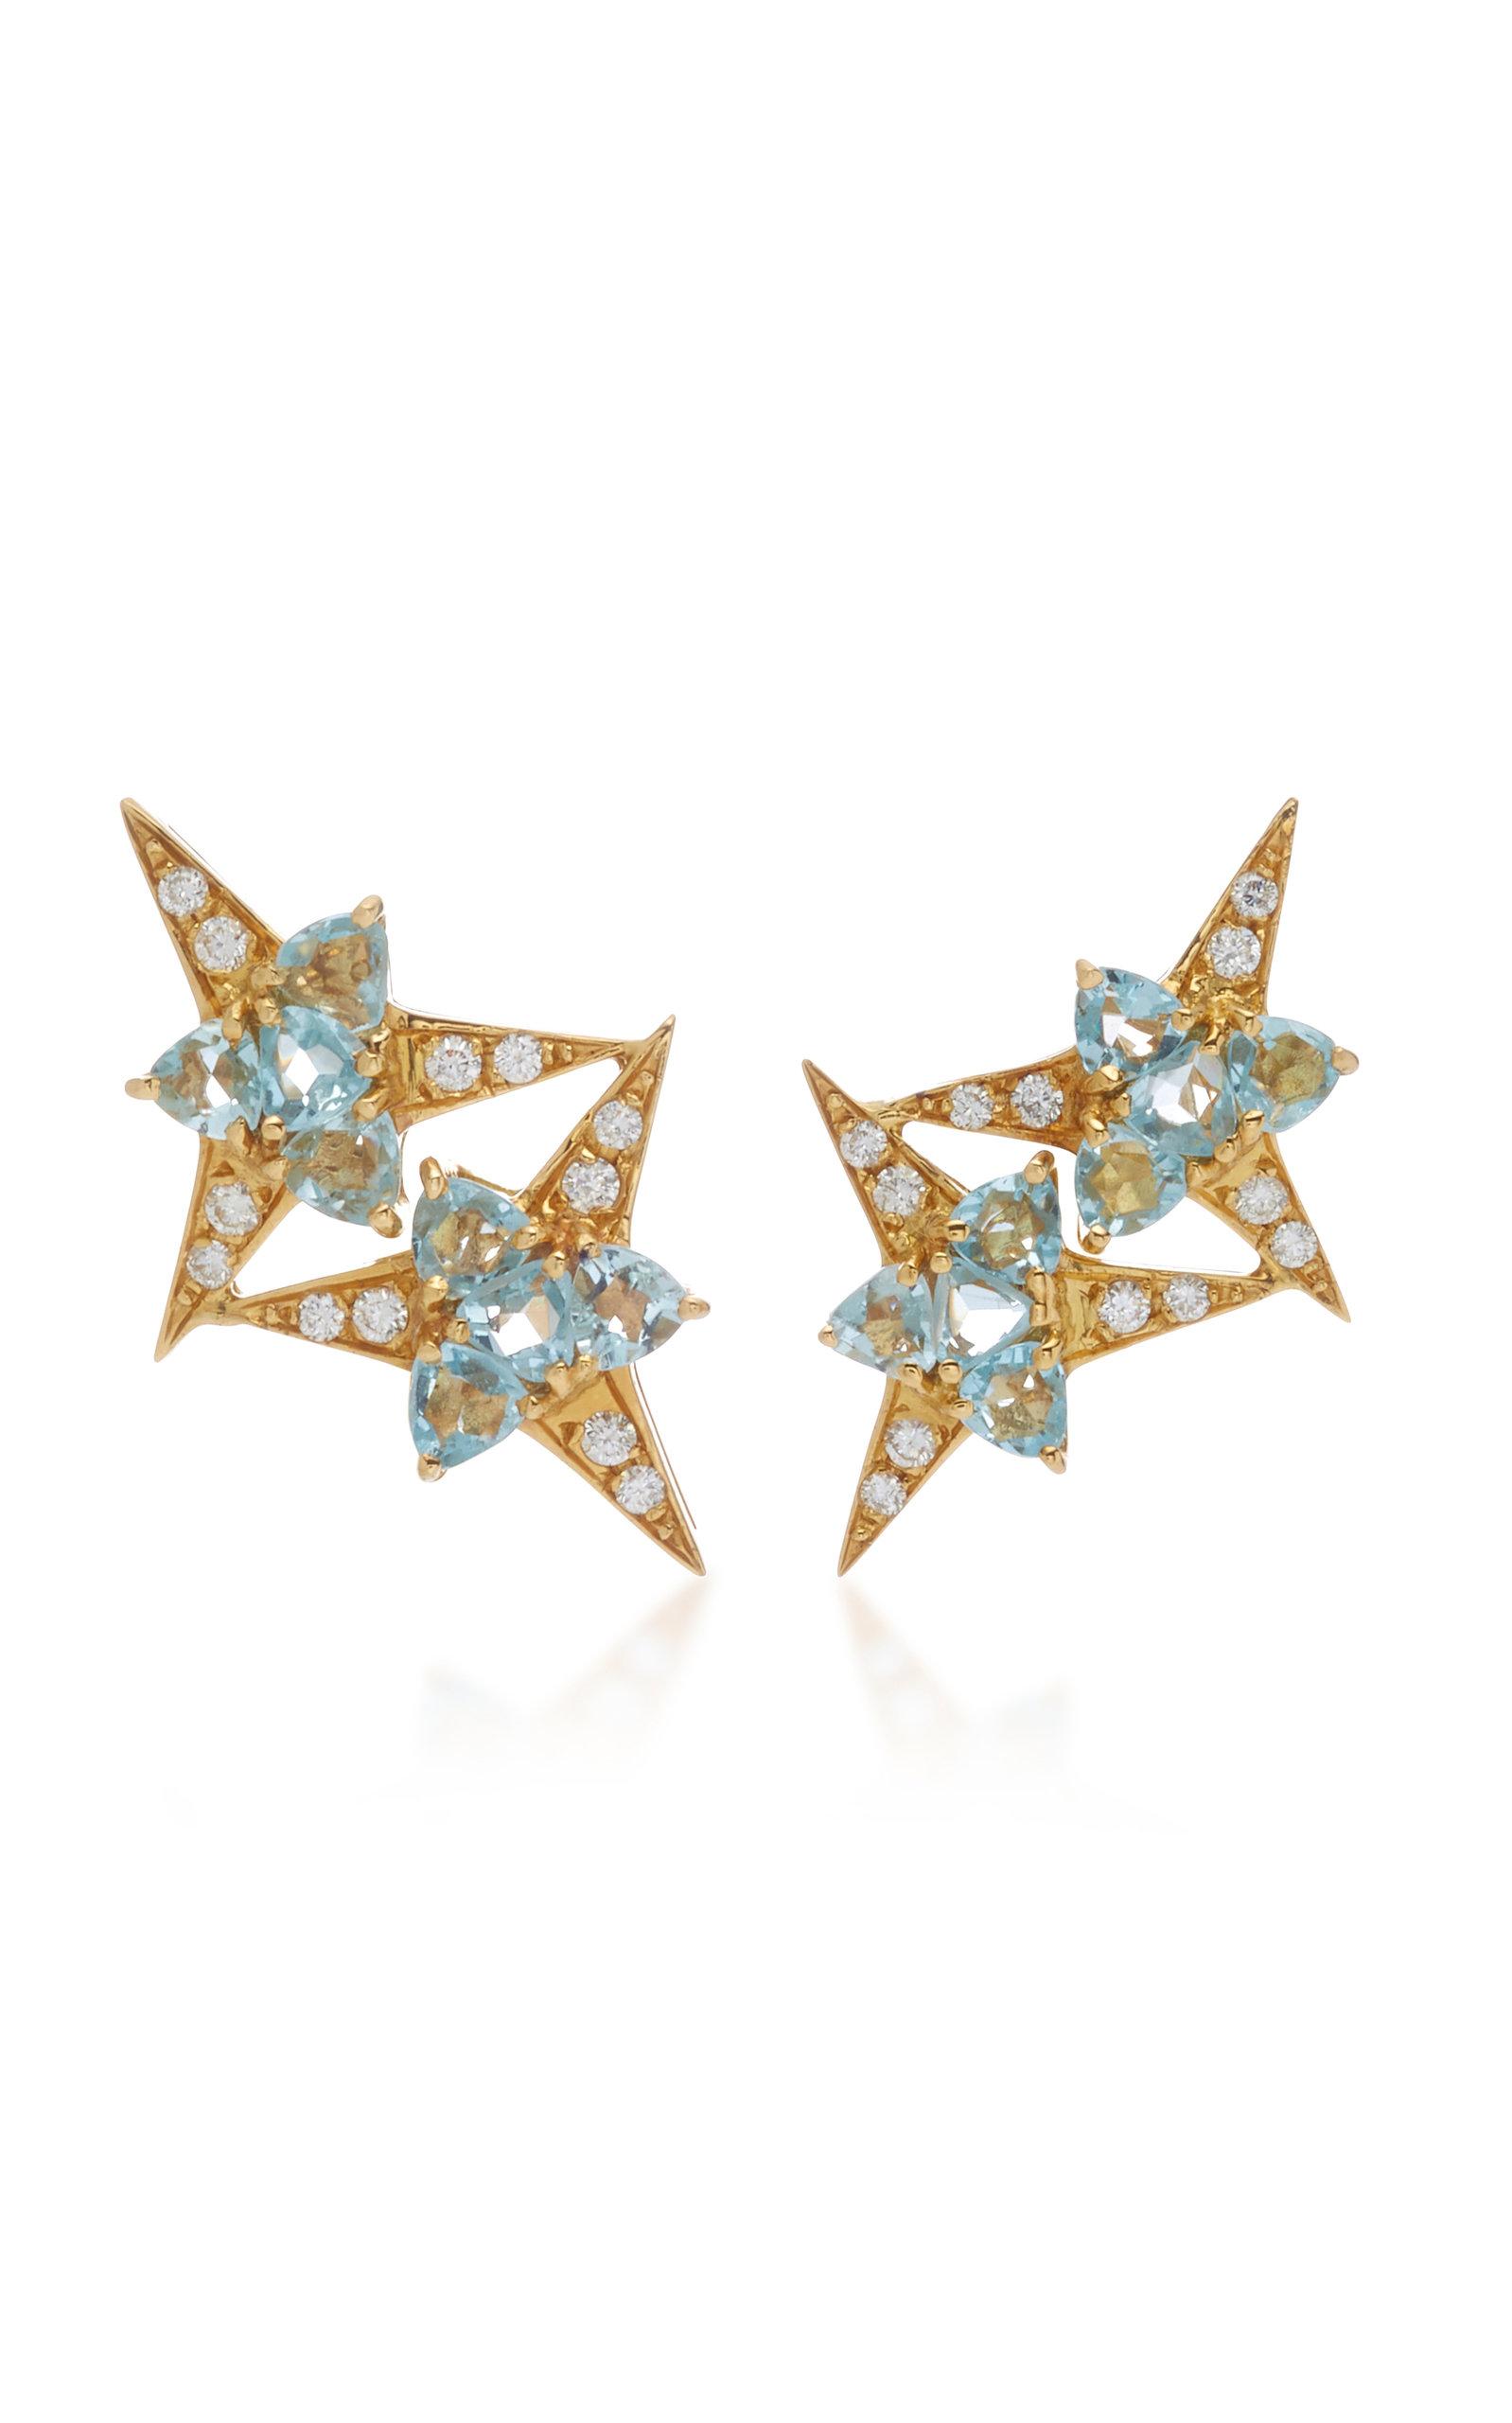 CAROL KAUFFMANN Galactic Star 18K Gold Aquamarine And Diamond Earrings in Blue